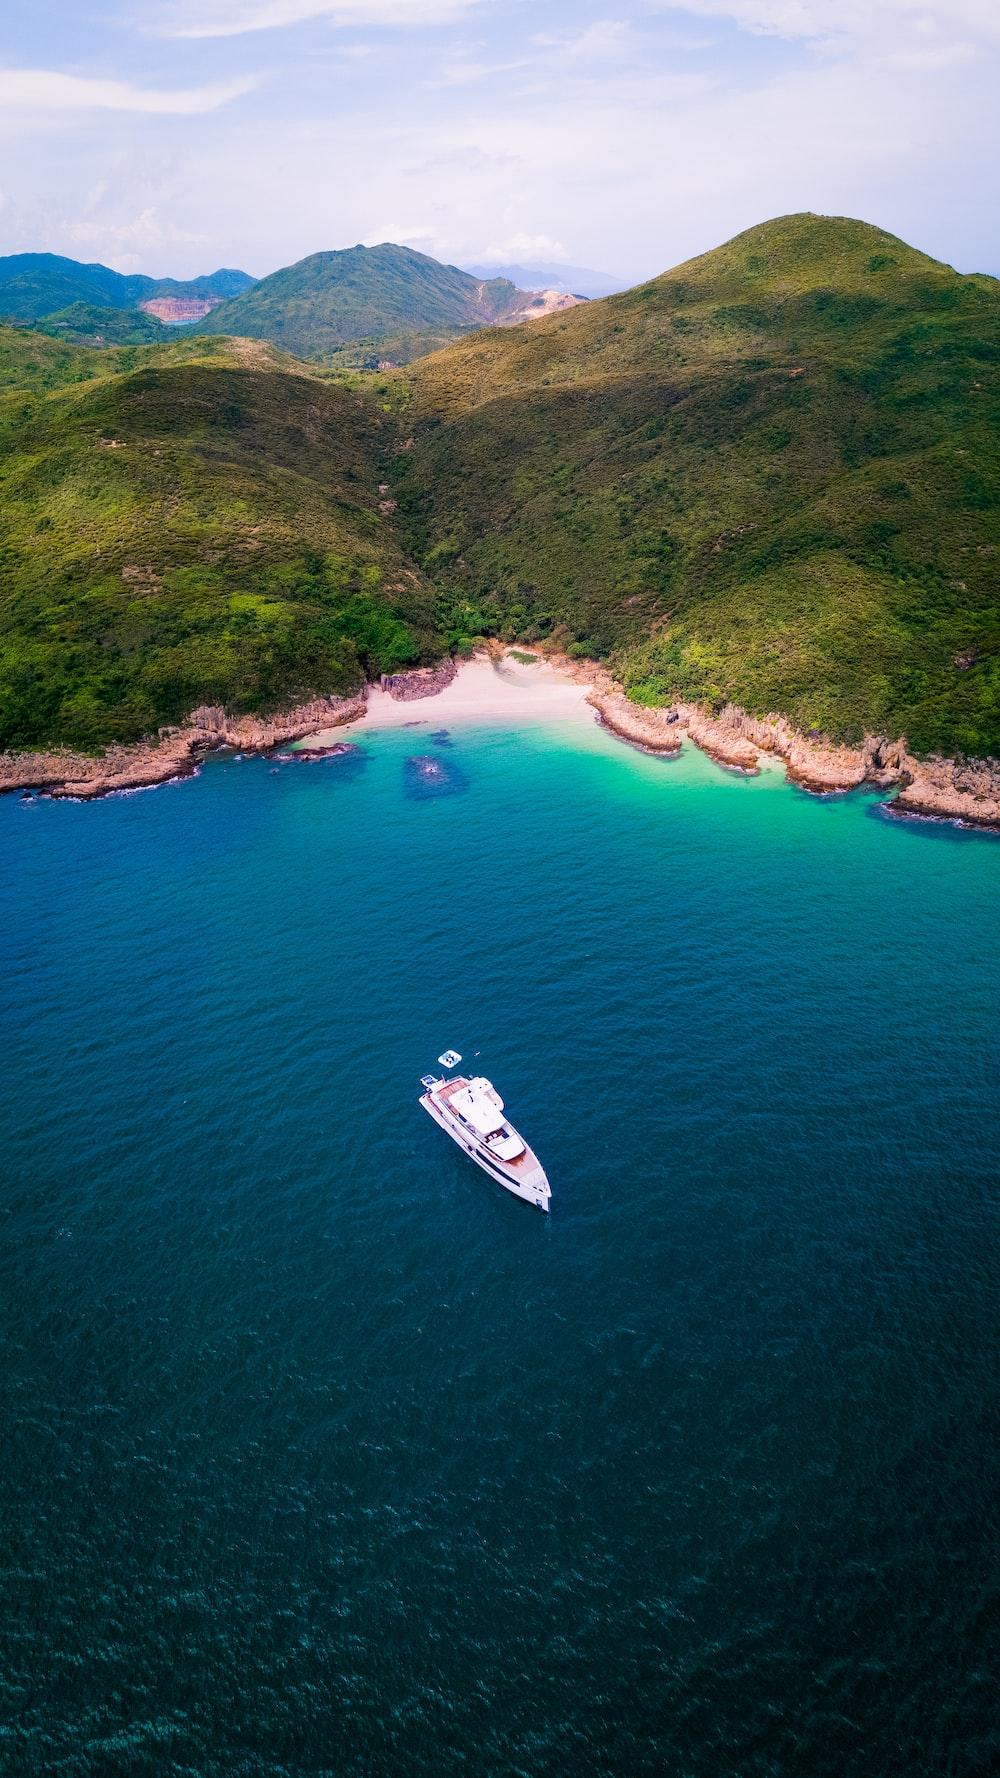 white boat on sea near green mountain during daytime